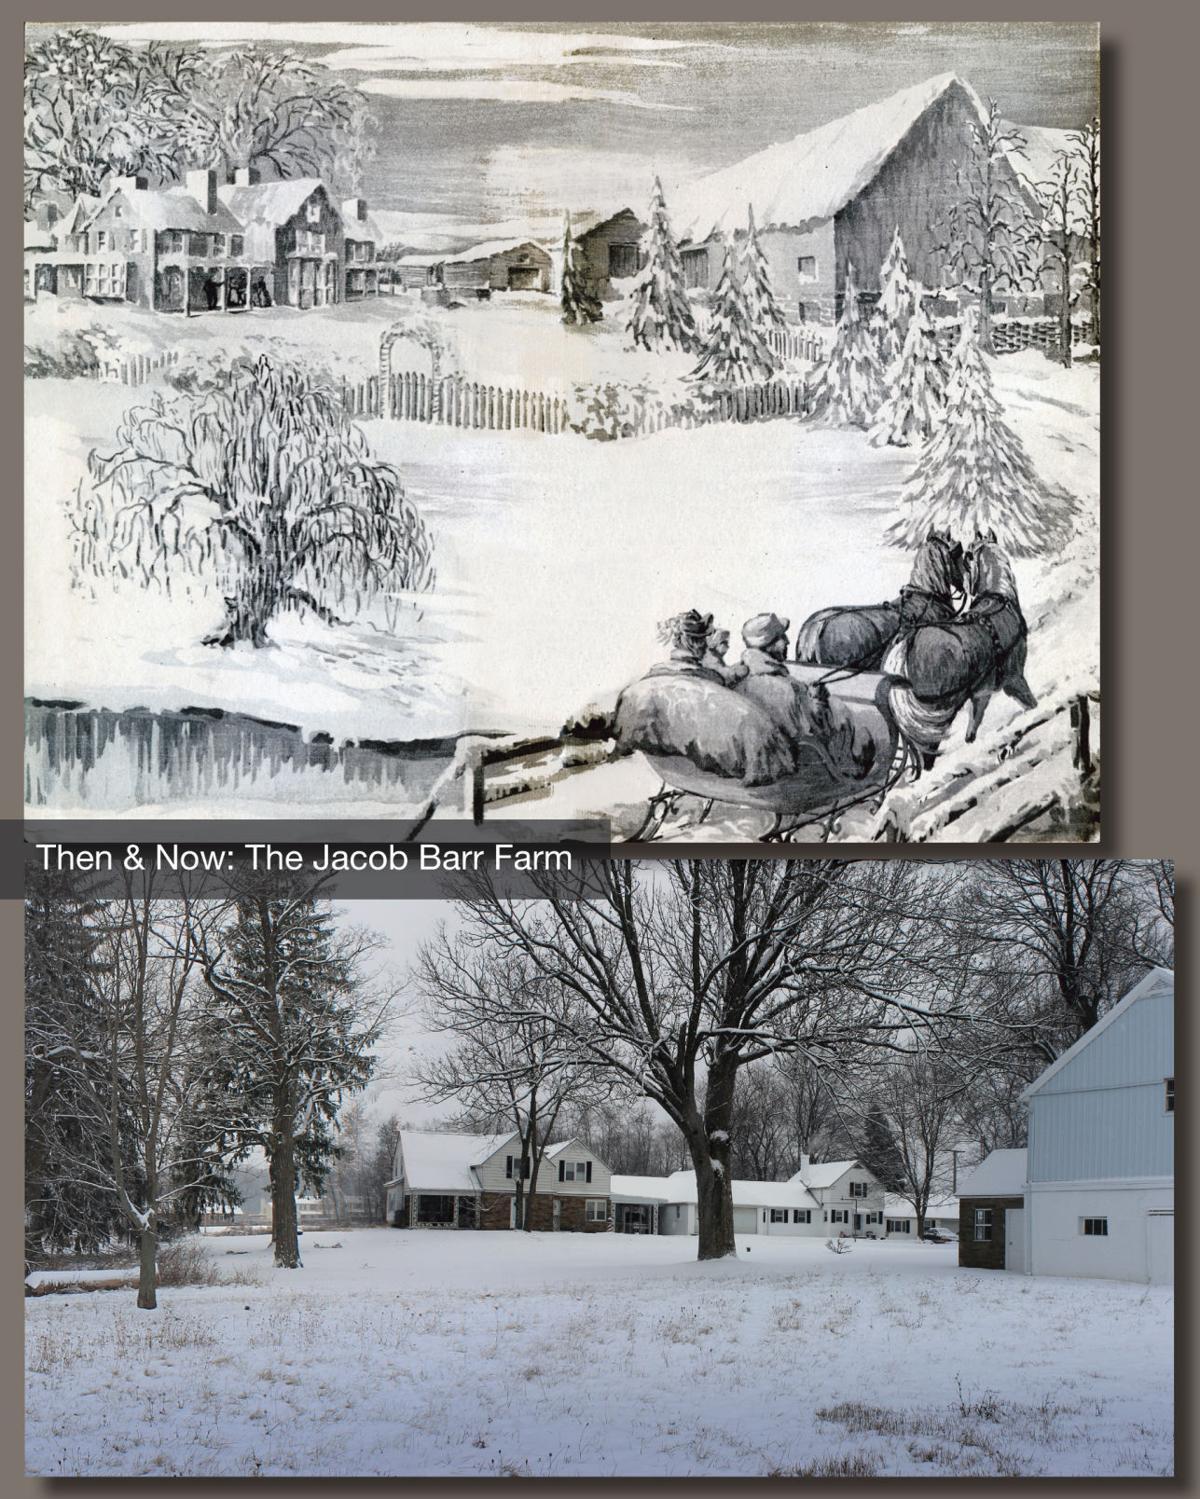 Barm Farm: Then & Now